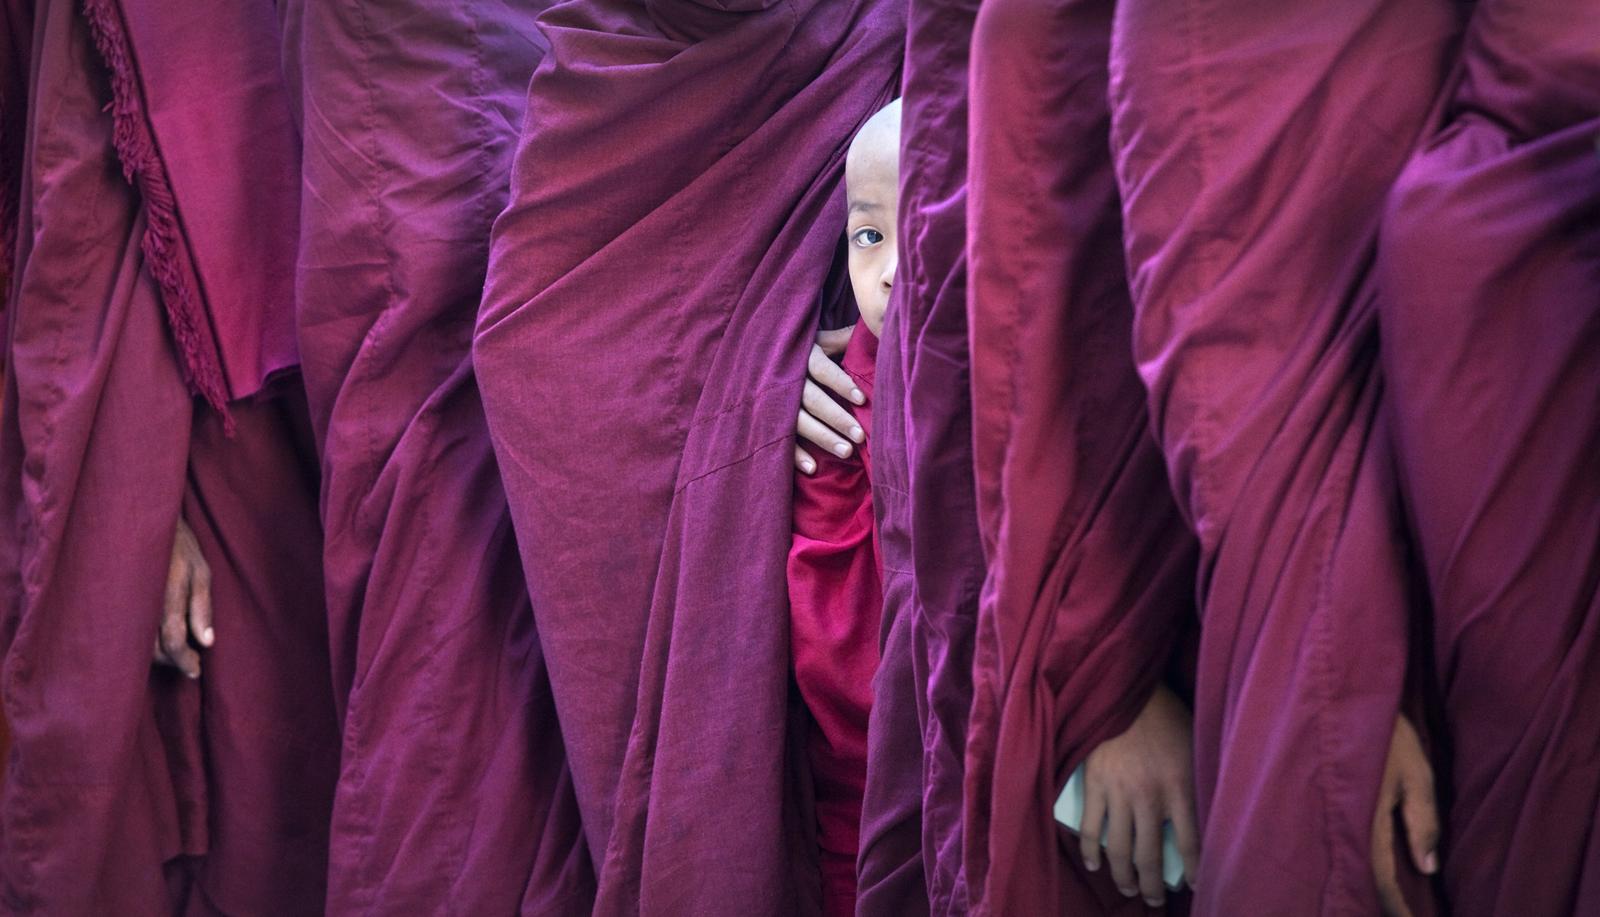 Novice Monk In Robes. Photo: Lynn Gail